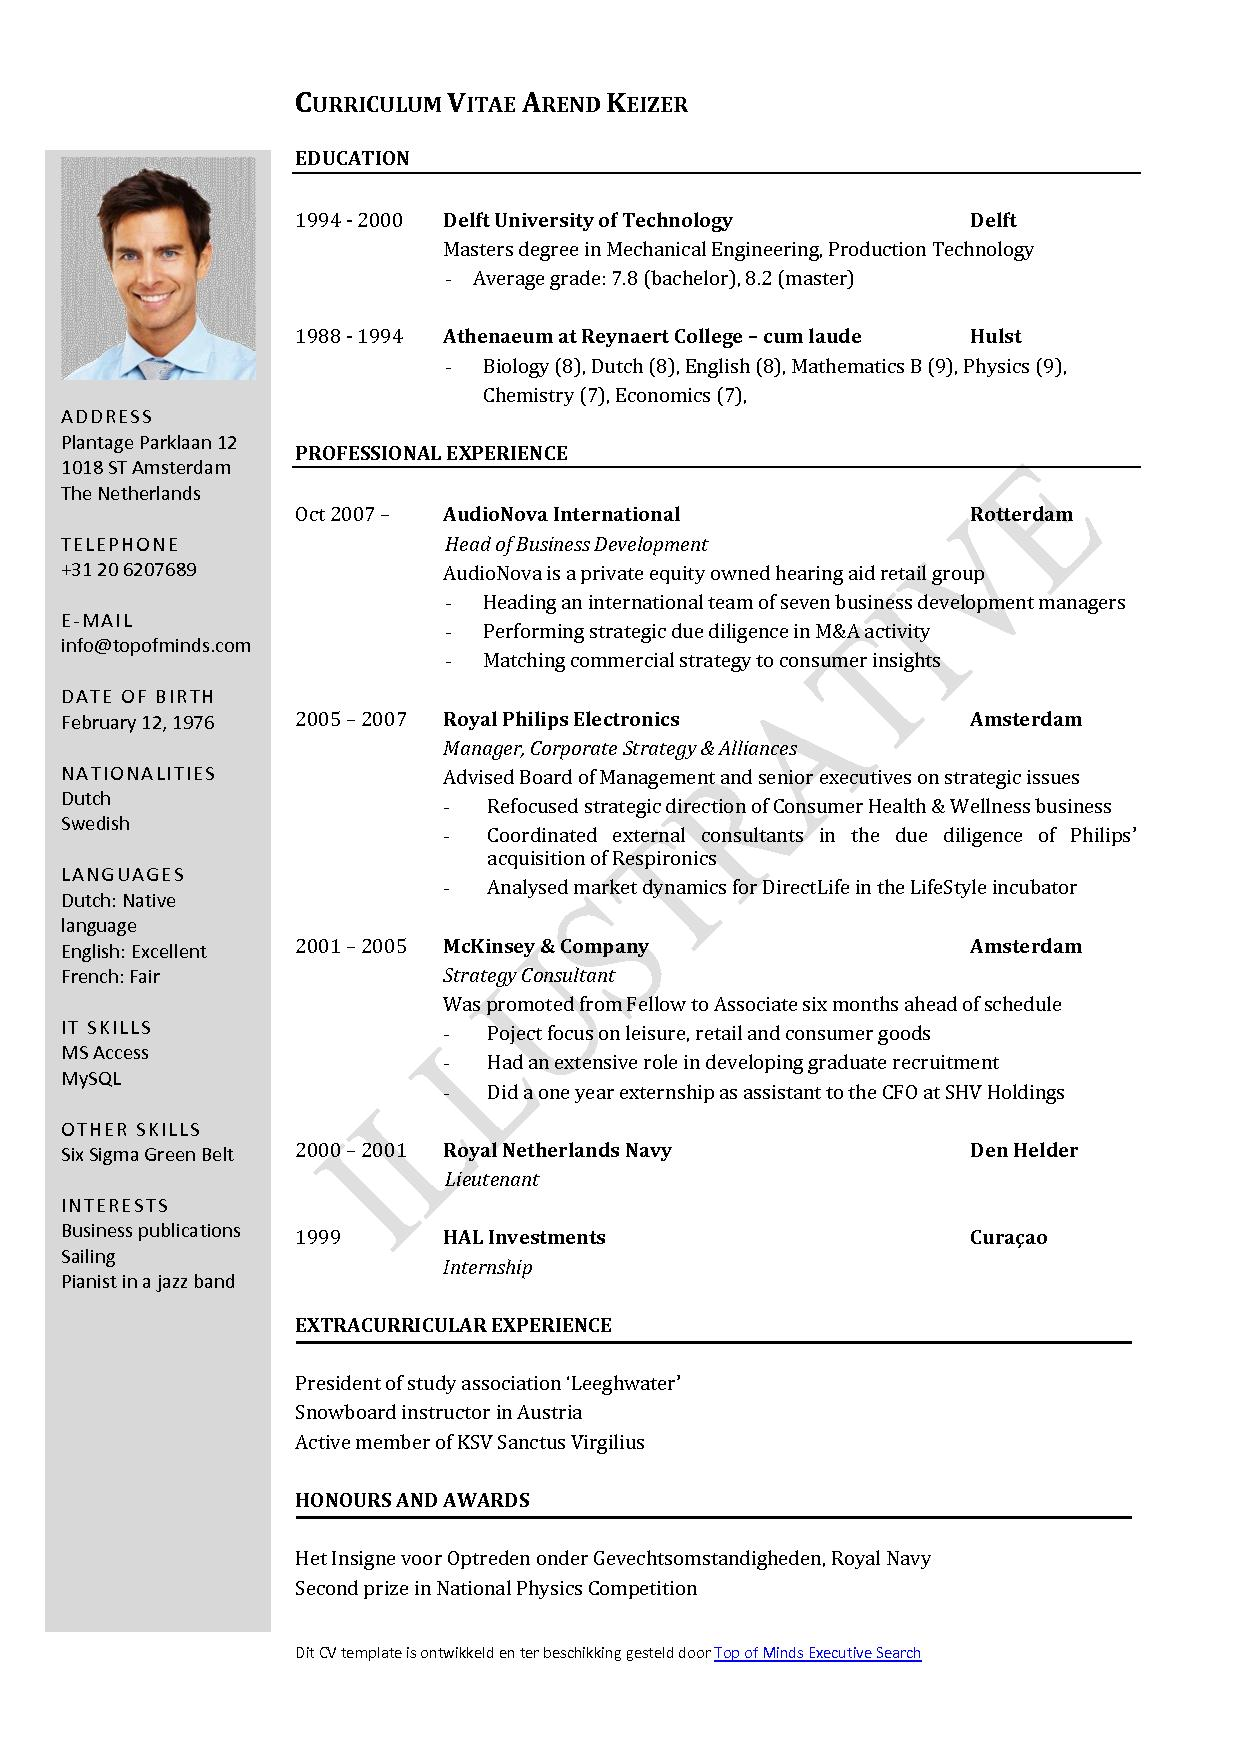 Free Curriculum Vitae Template Word